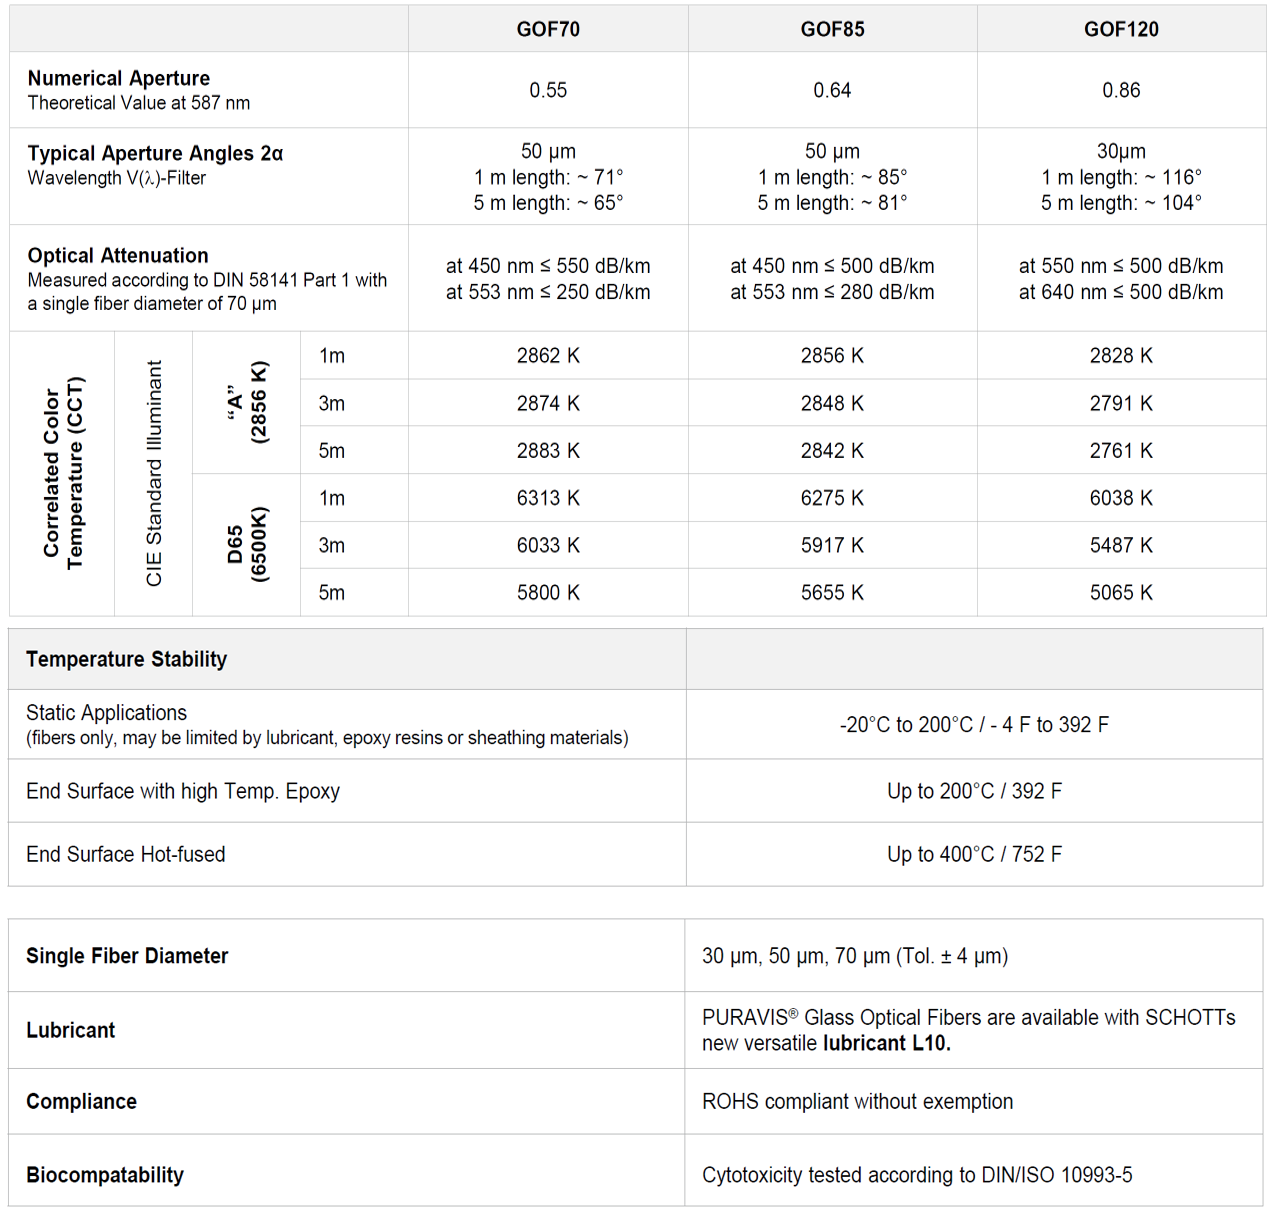 Table showing the general data of SCHOTT PURAVIS® glass optical fibers